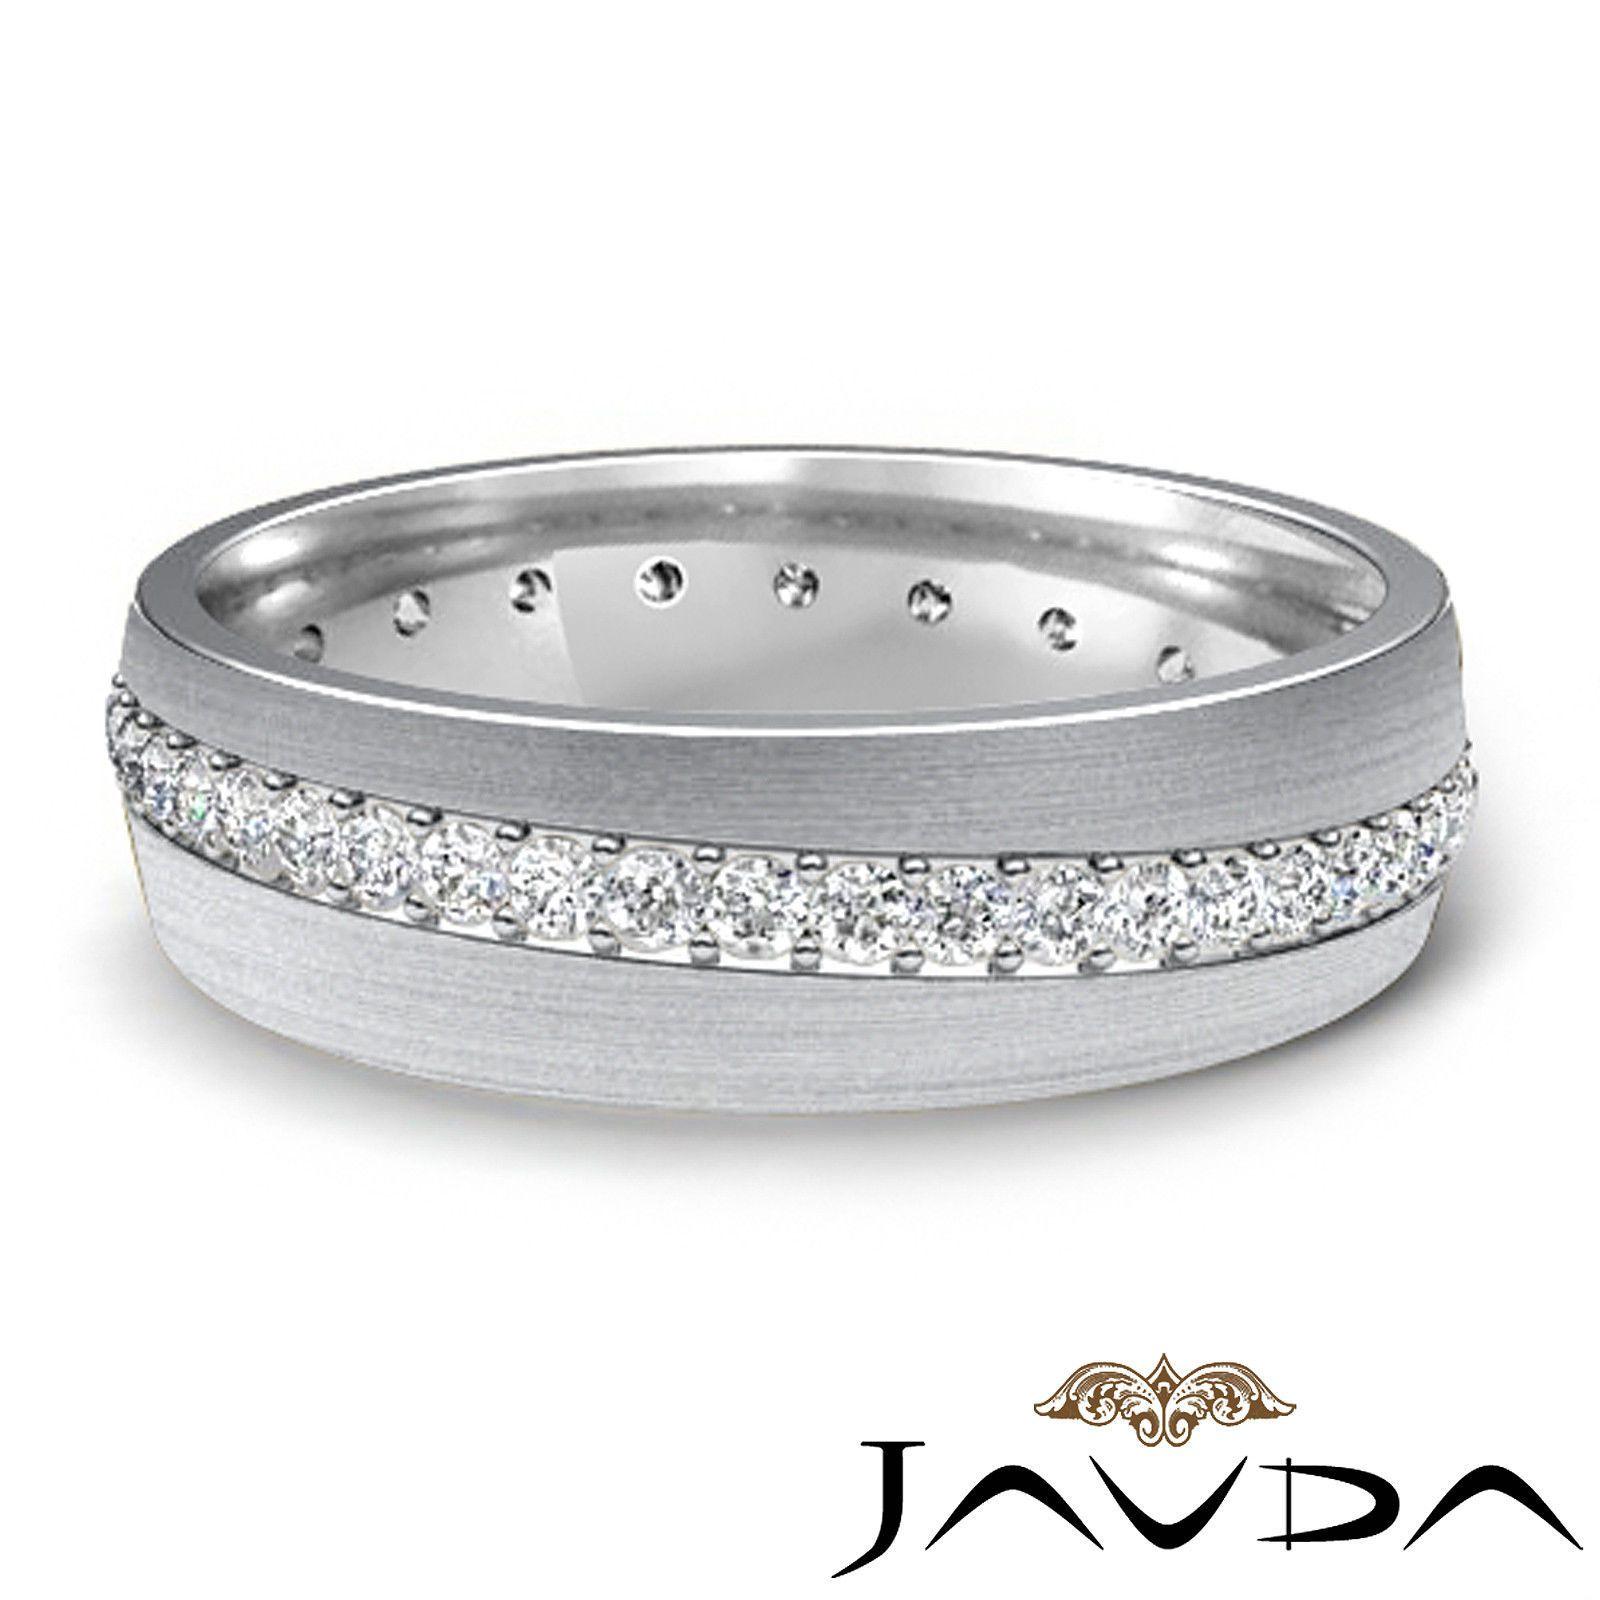 Dome Wedding Band 18k White Gold Round Pave Set Diamond